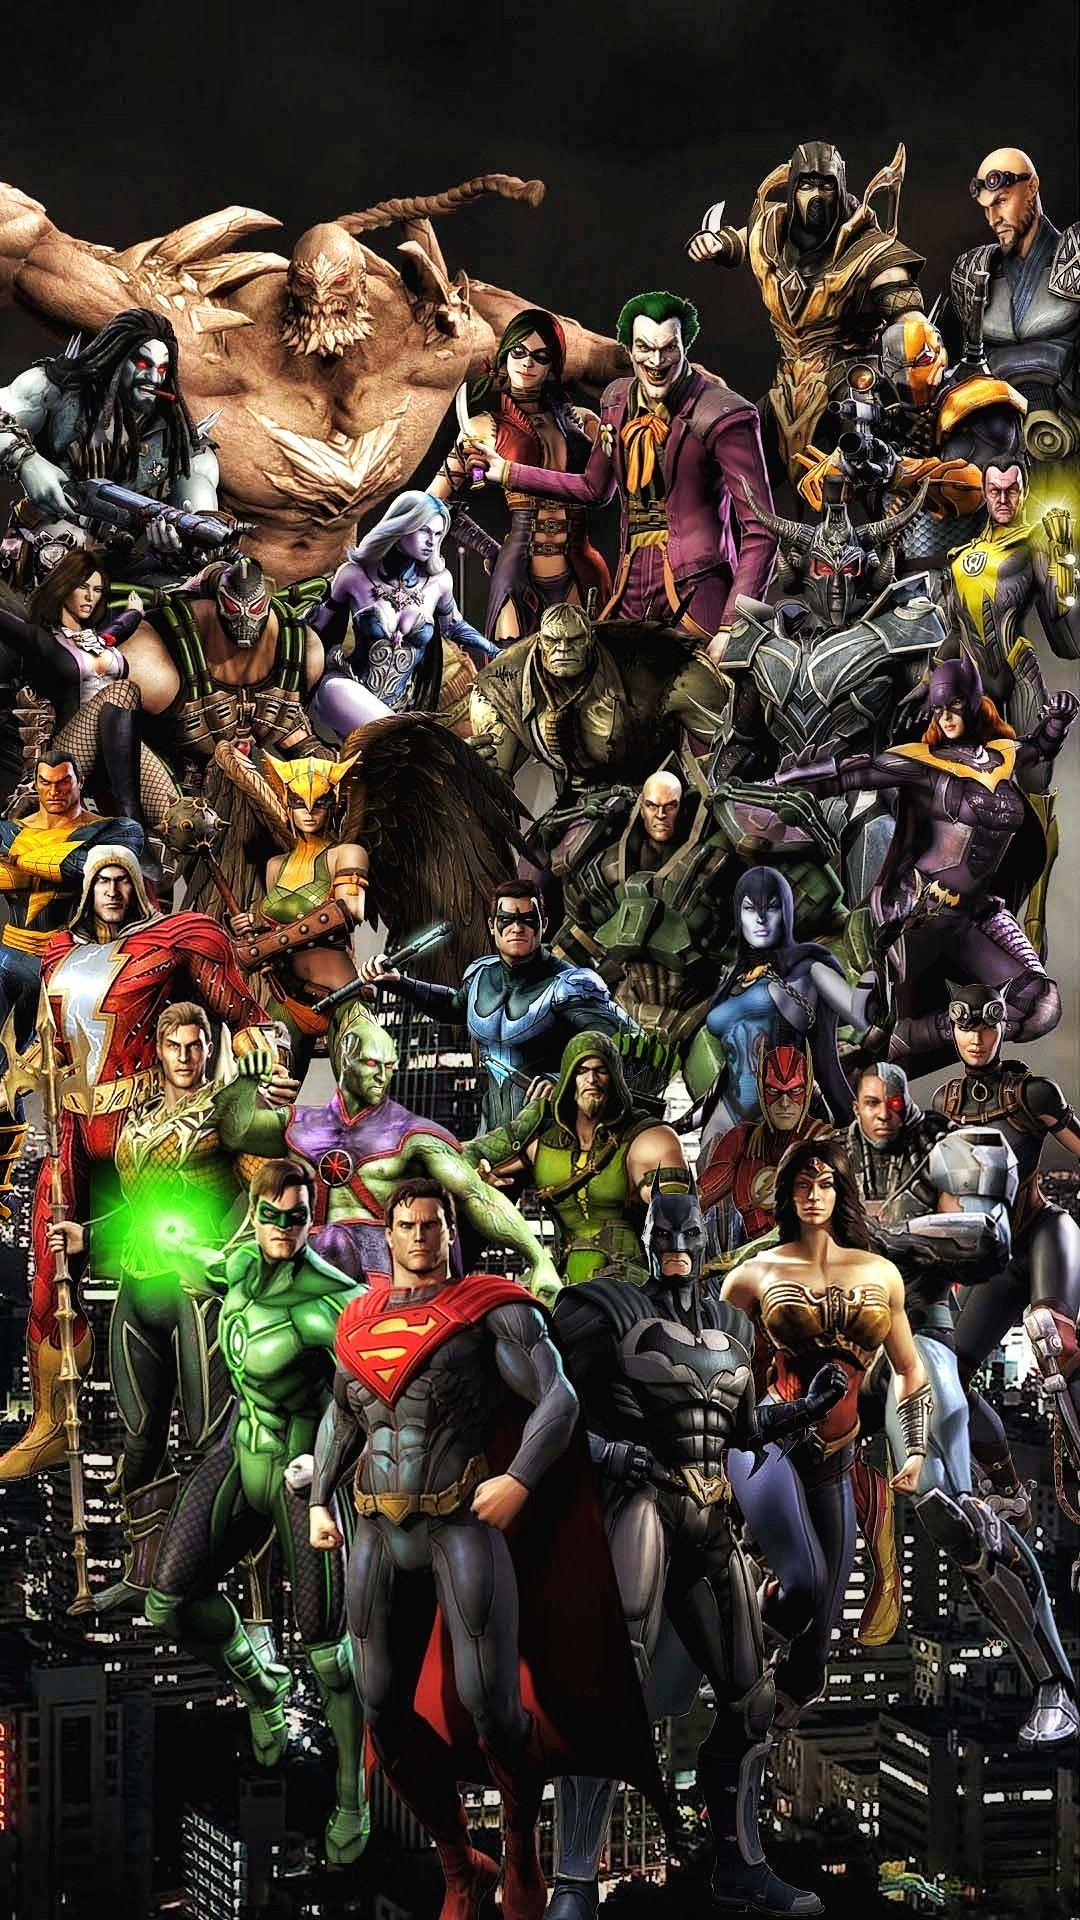 Injustice Gods Among Us Wallpaper For Smartphone Dc Comics Characters Comic Villains Dc Comics Superheroes